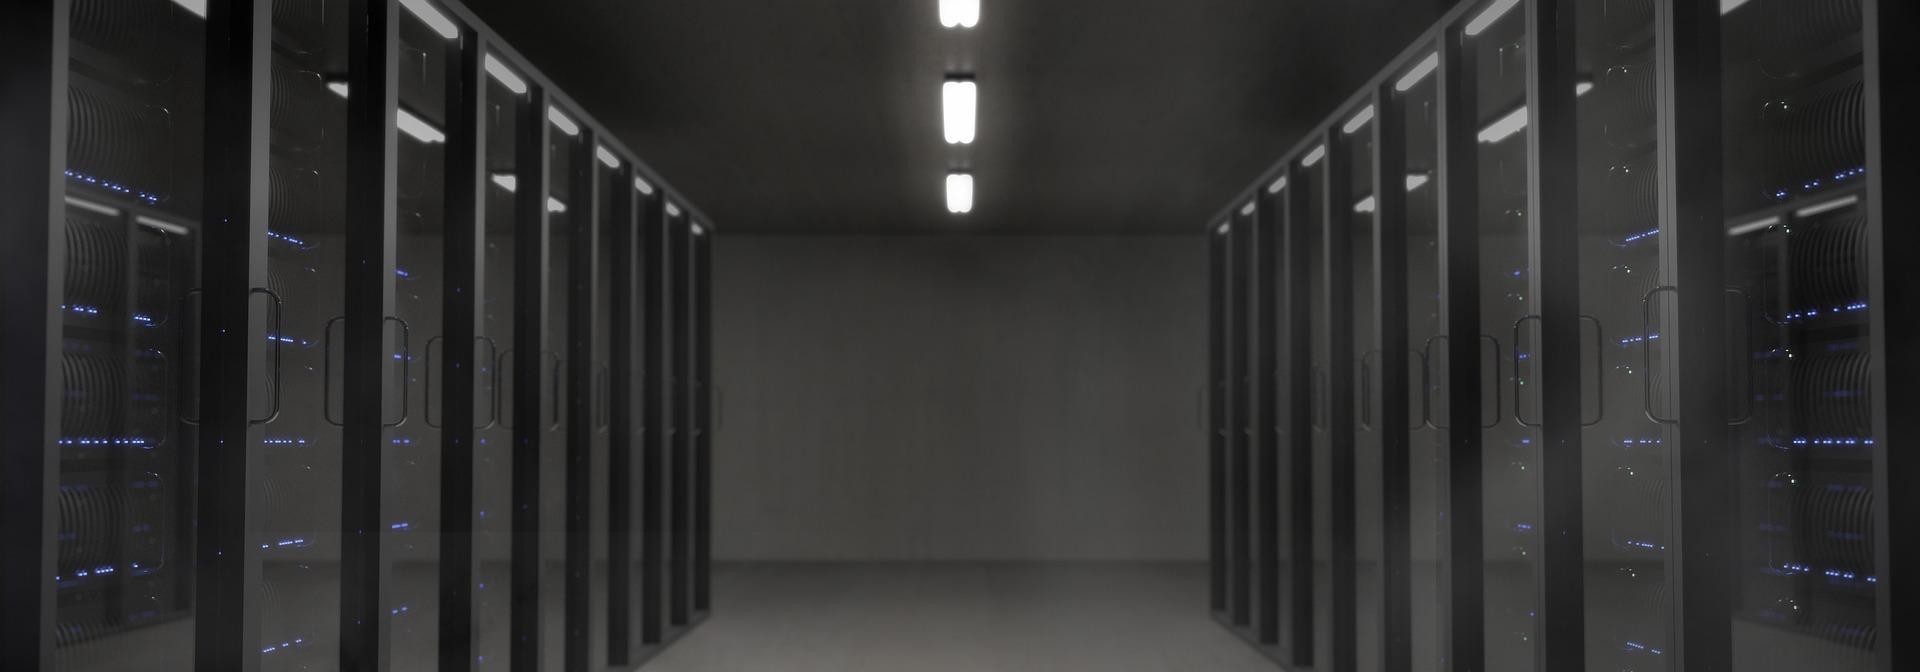 datapreparation_server_1920